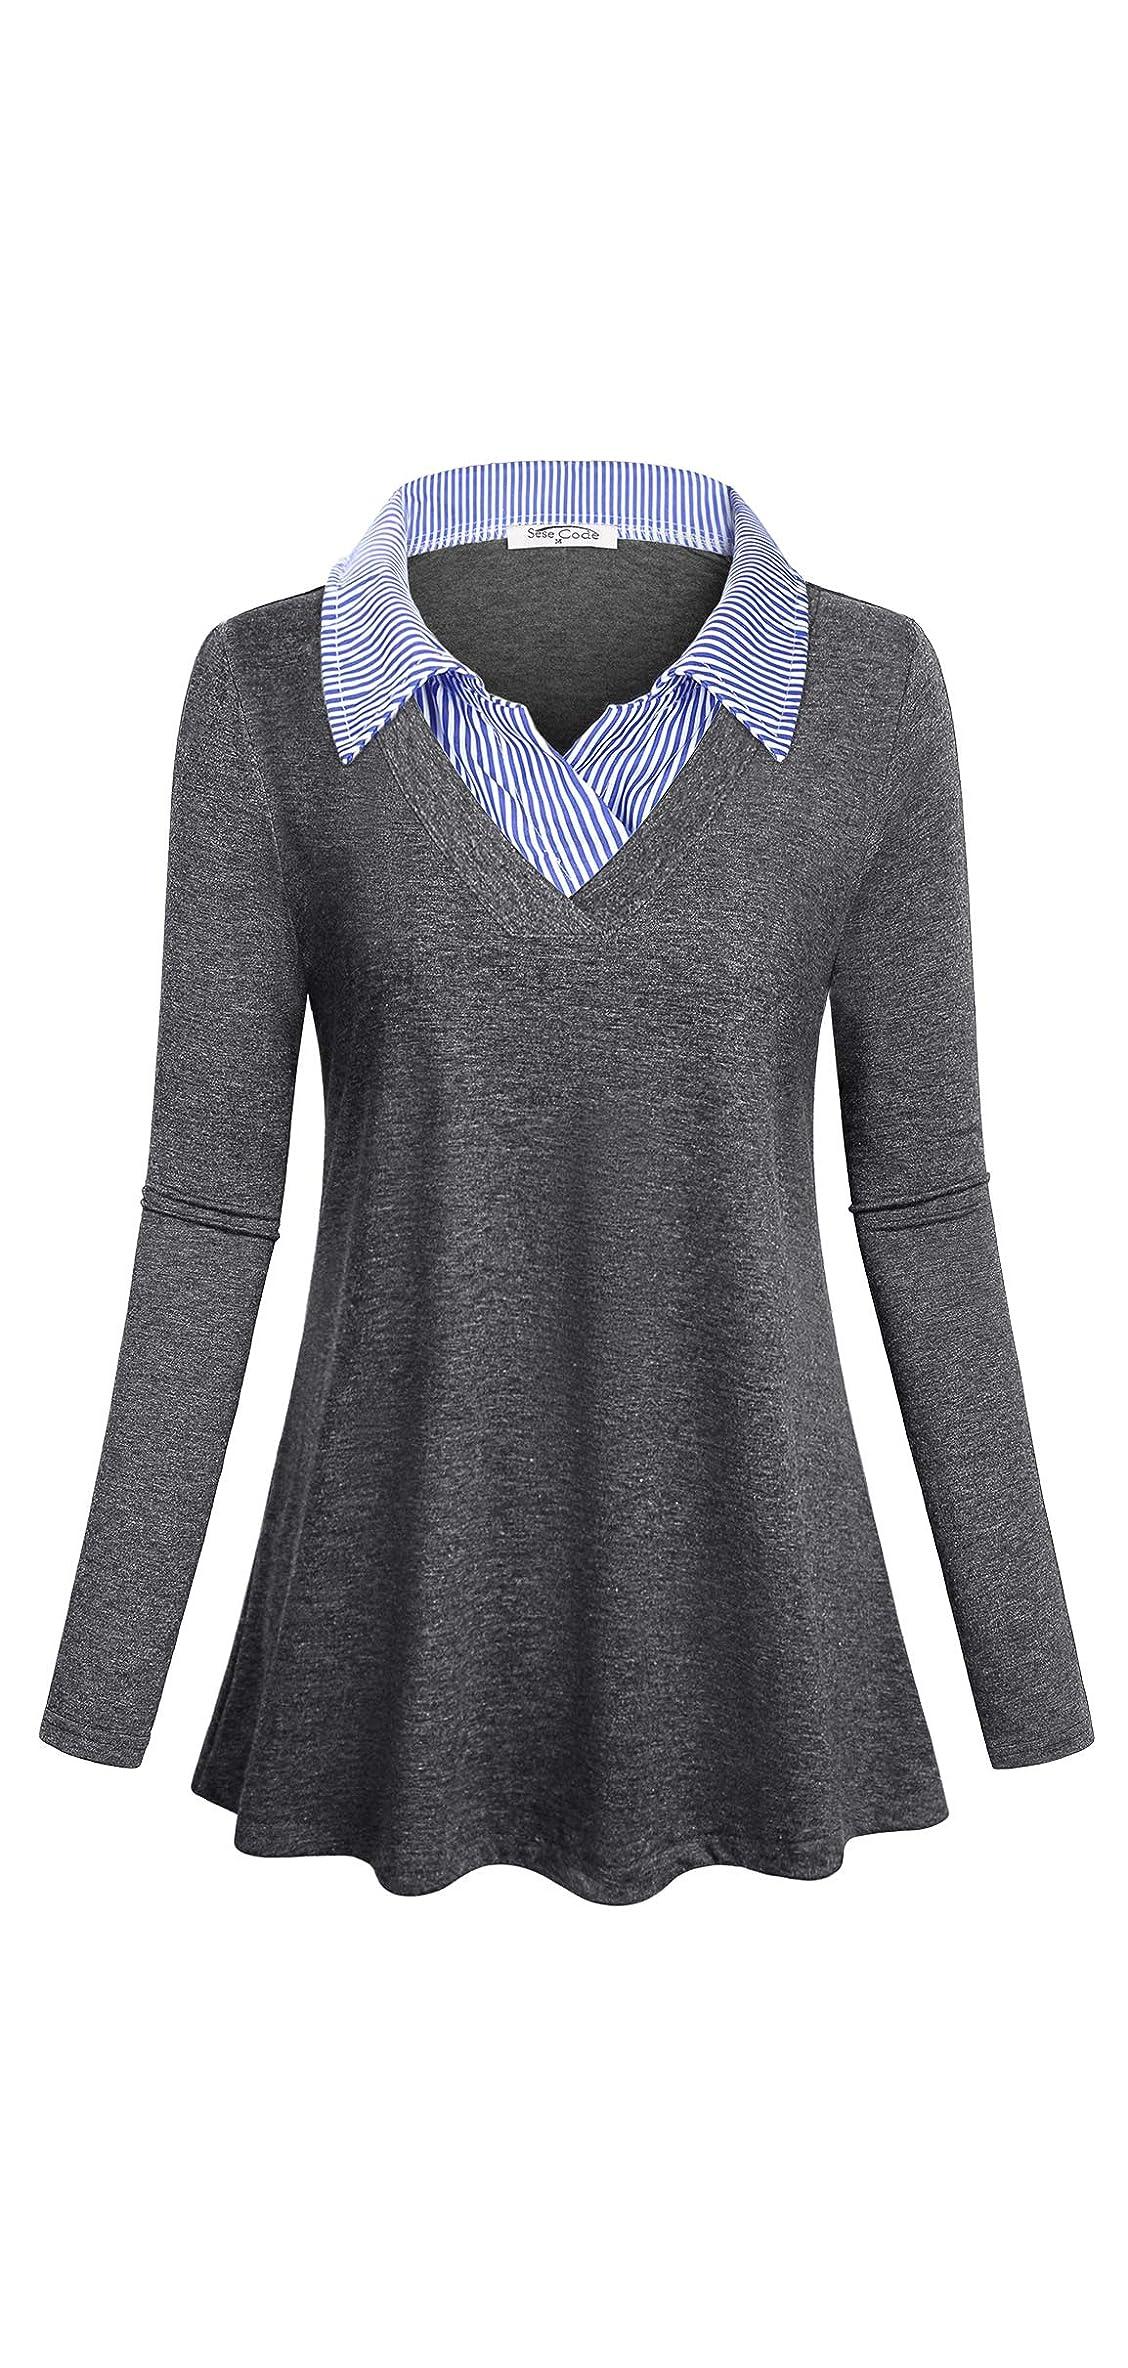 Women's Long Sleeve Contrast Collar Shirt A-line Tunic